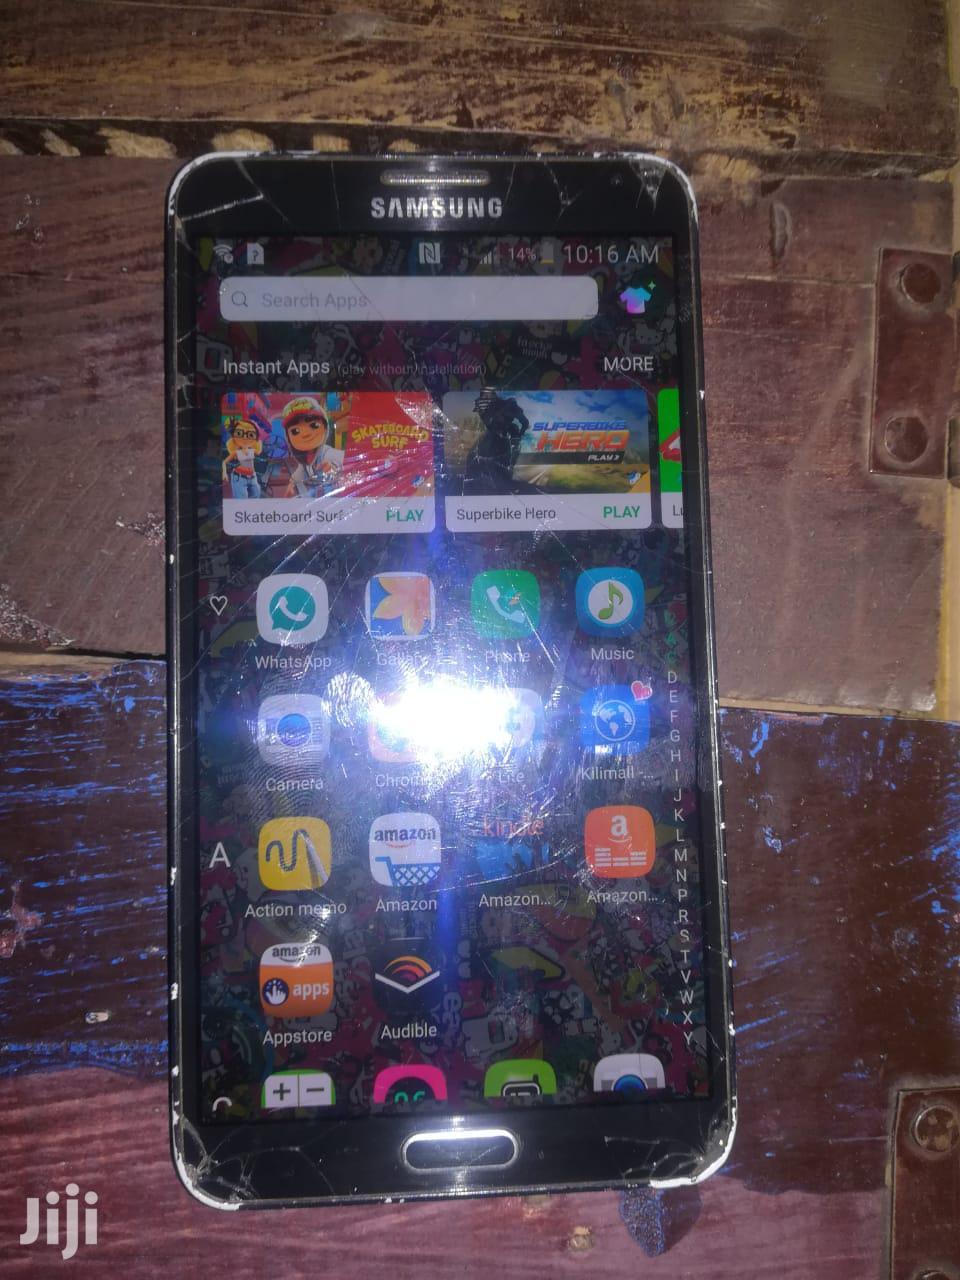 Archive: Samsung Galaxy S6 active 32 GB Black